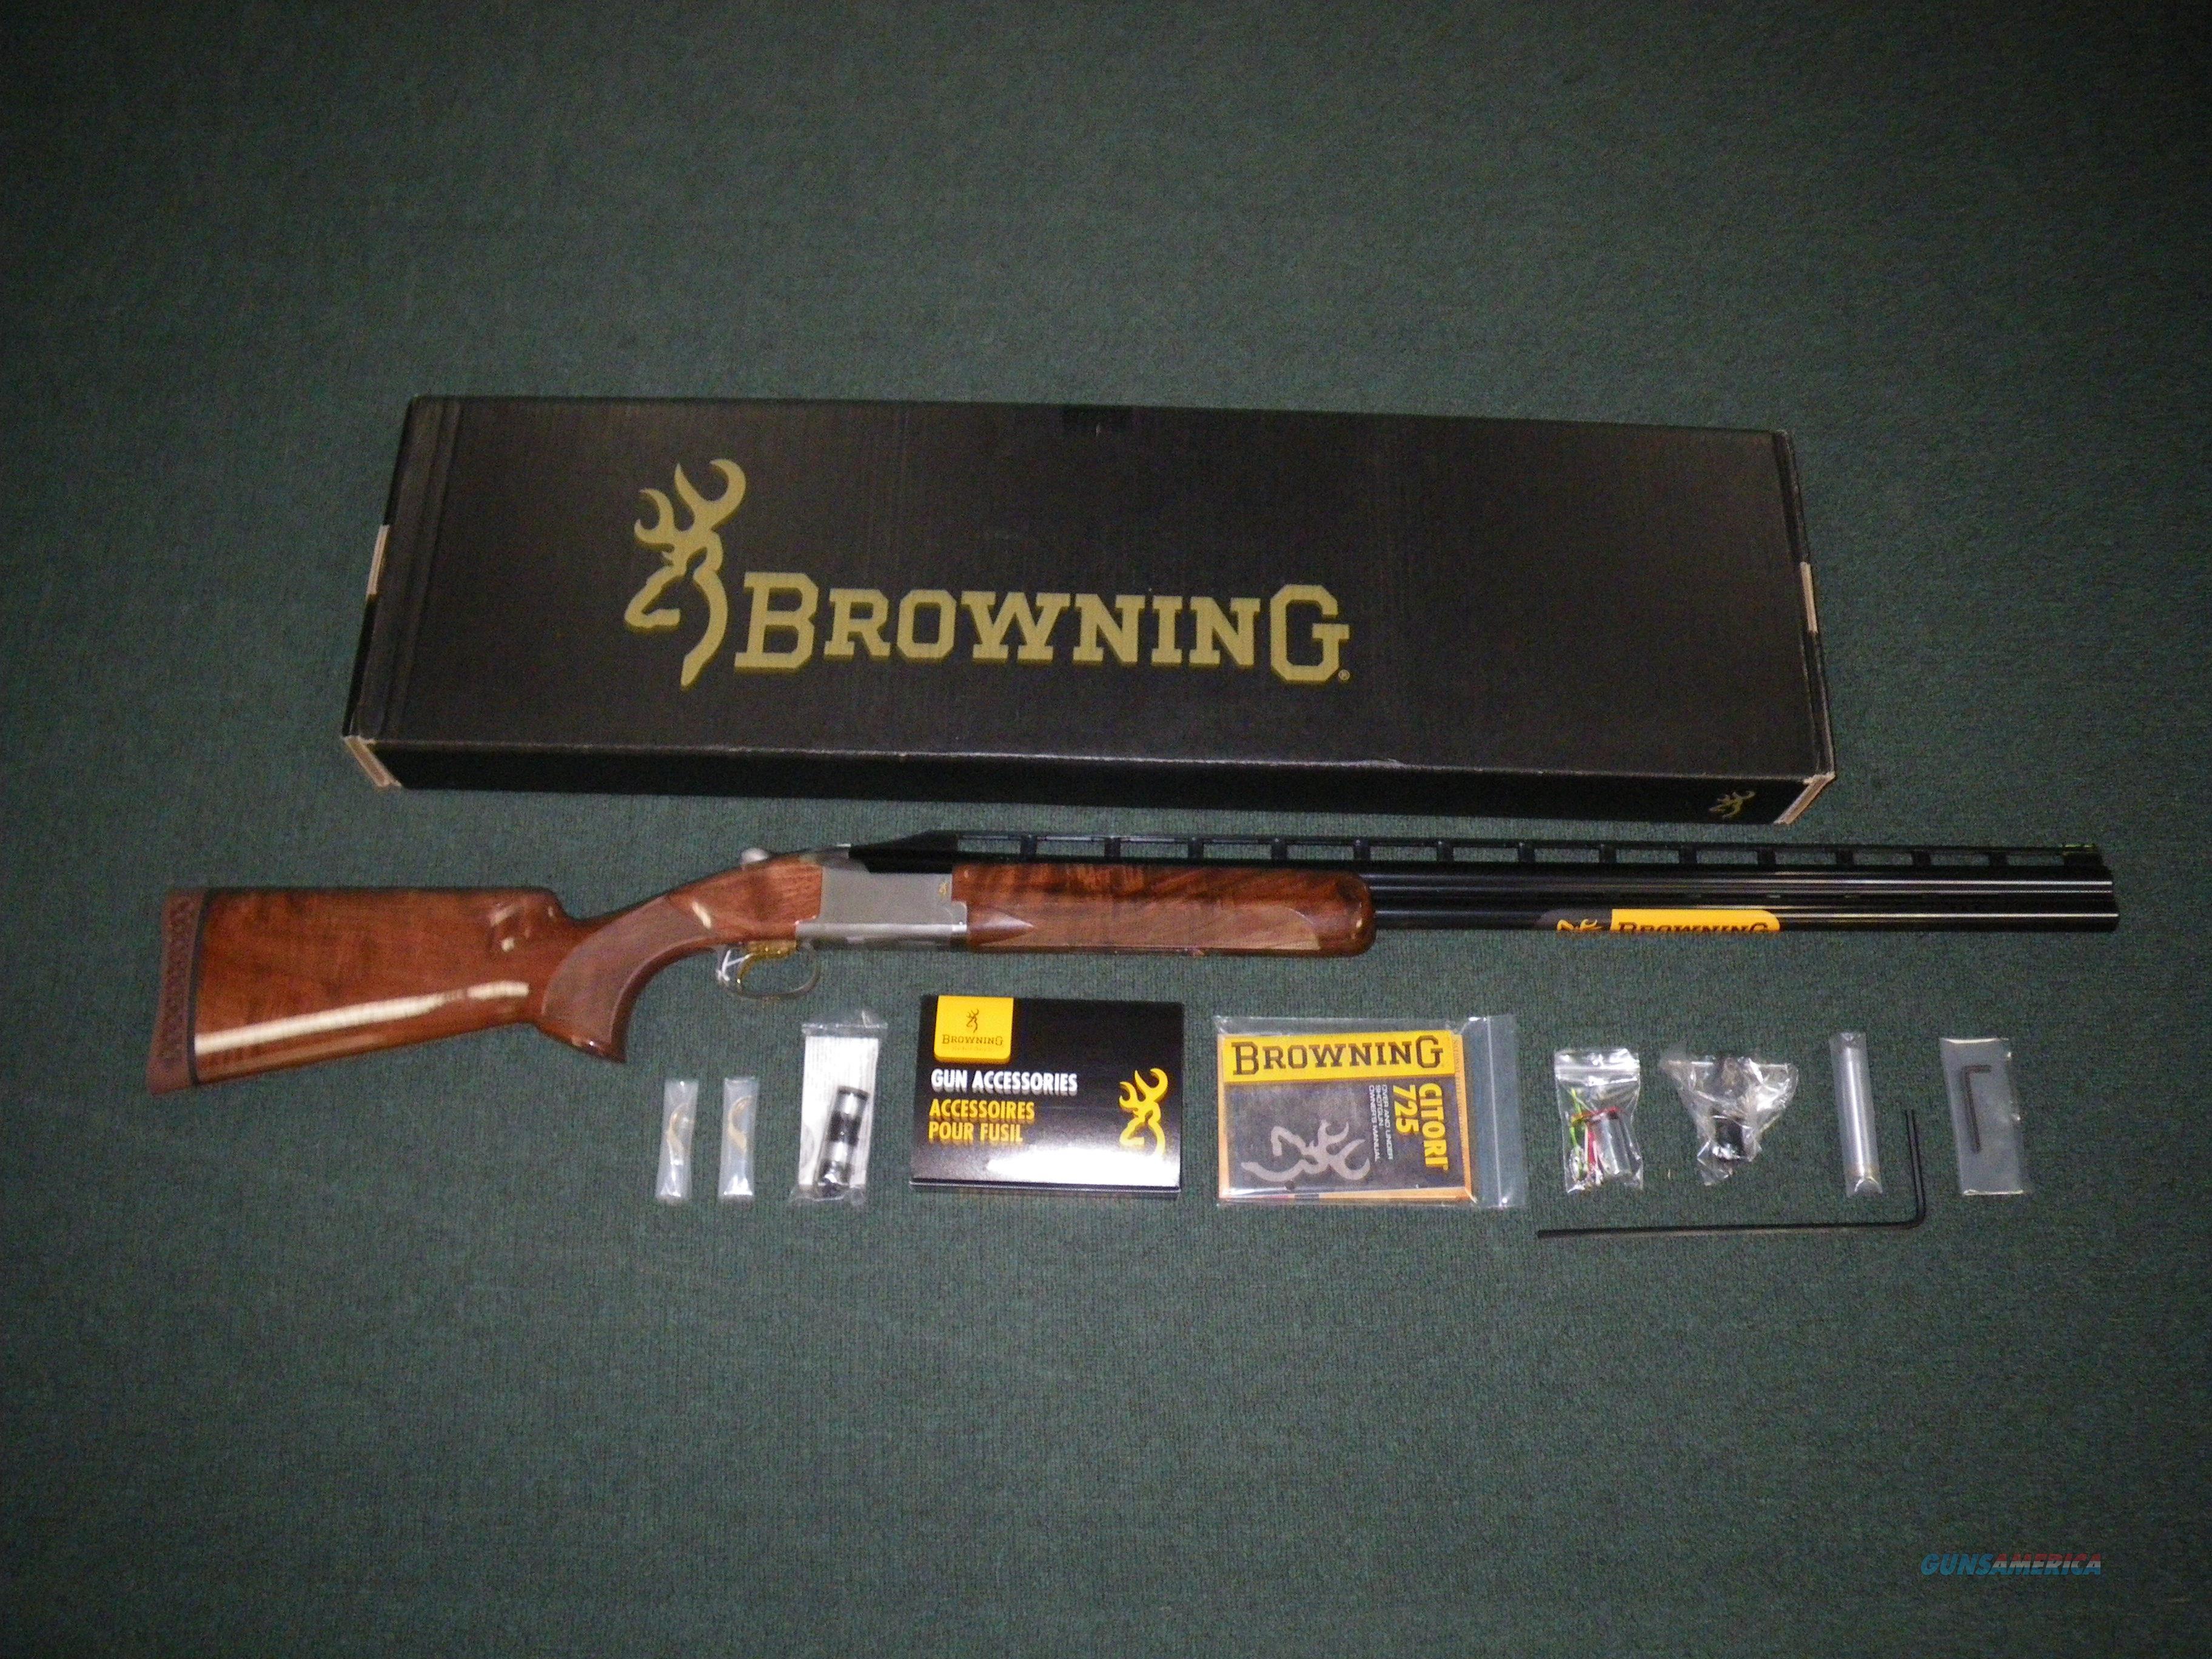 "Browning Citori 725 Trap 12ga 32"" Adjustable Comb #0135803009  Guns > Shotguns > Browning Shotguns > Over Unders > Citori > Hunting"